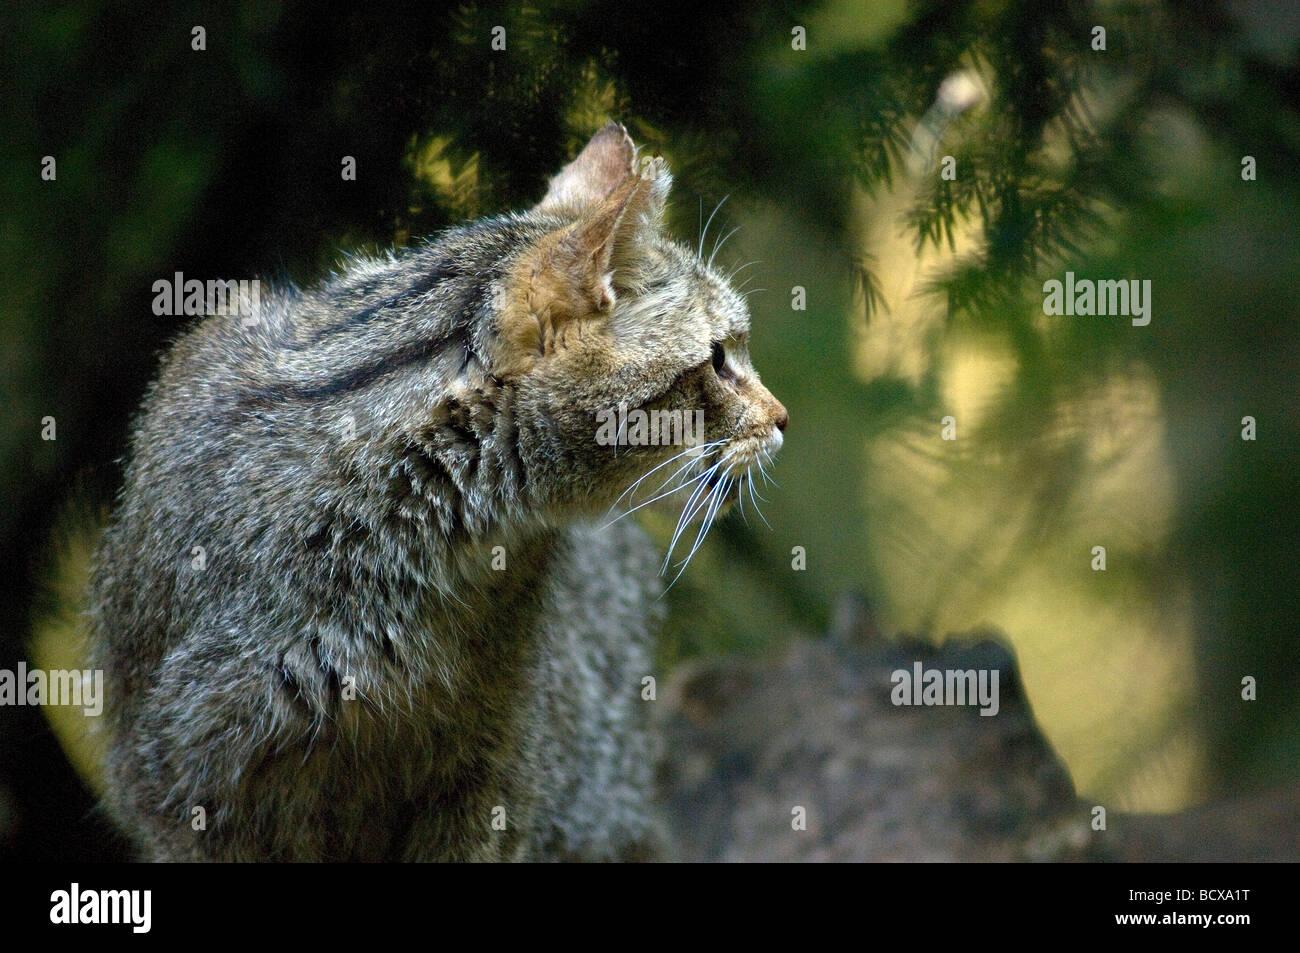 gatto selvatico wild cat Felis silvestris felini bosco Bayerische Wald Germany Stock Photo